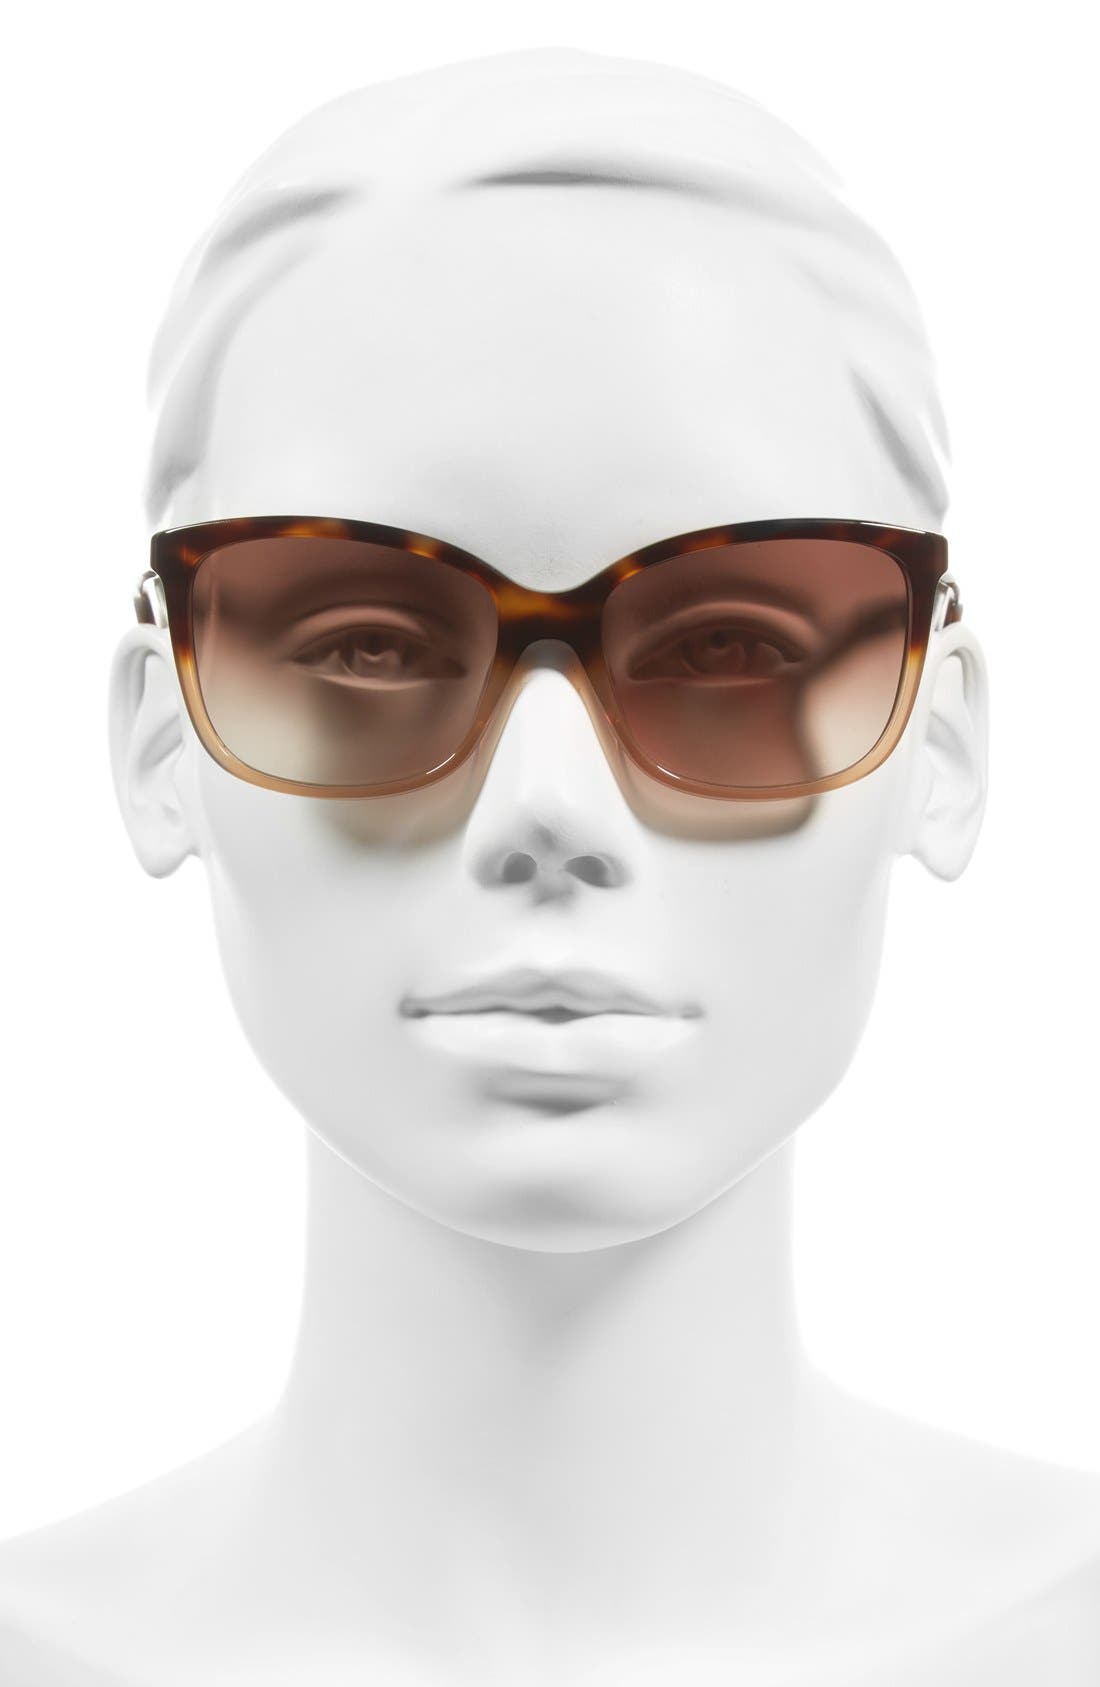 kasie 55mm cat eye sunglasses,                             Alternate thumbnail 2, color,                             Havana/ Nude